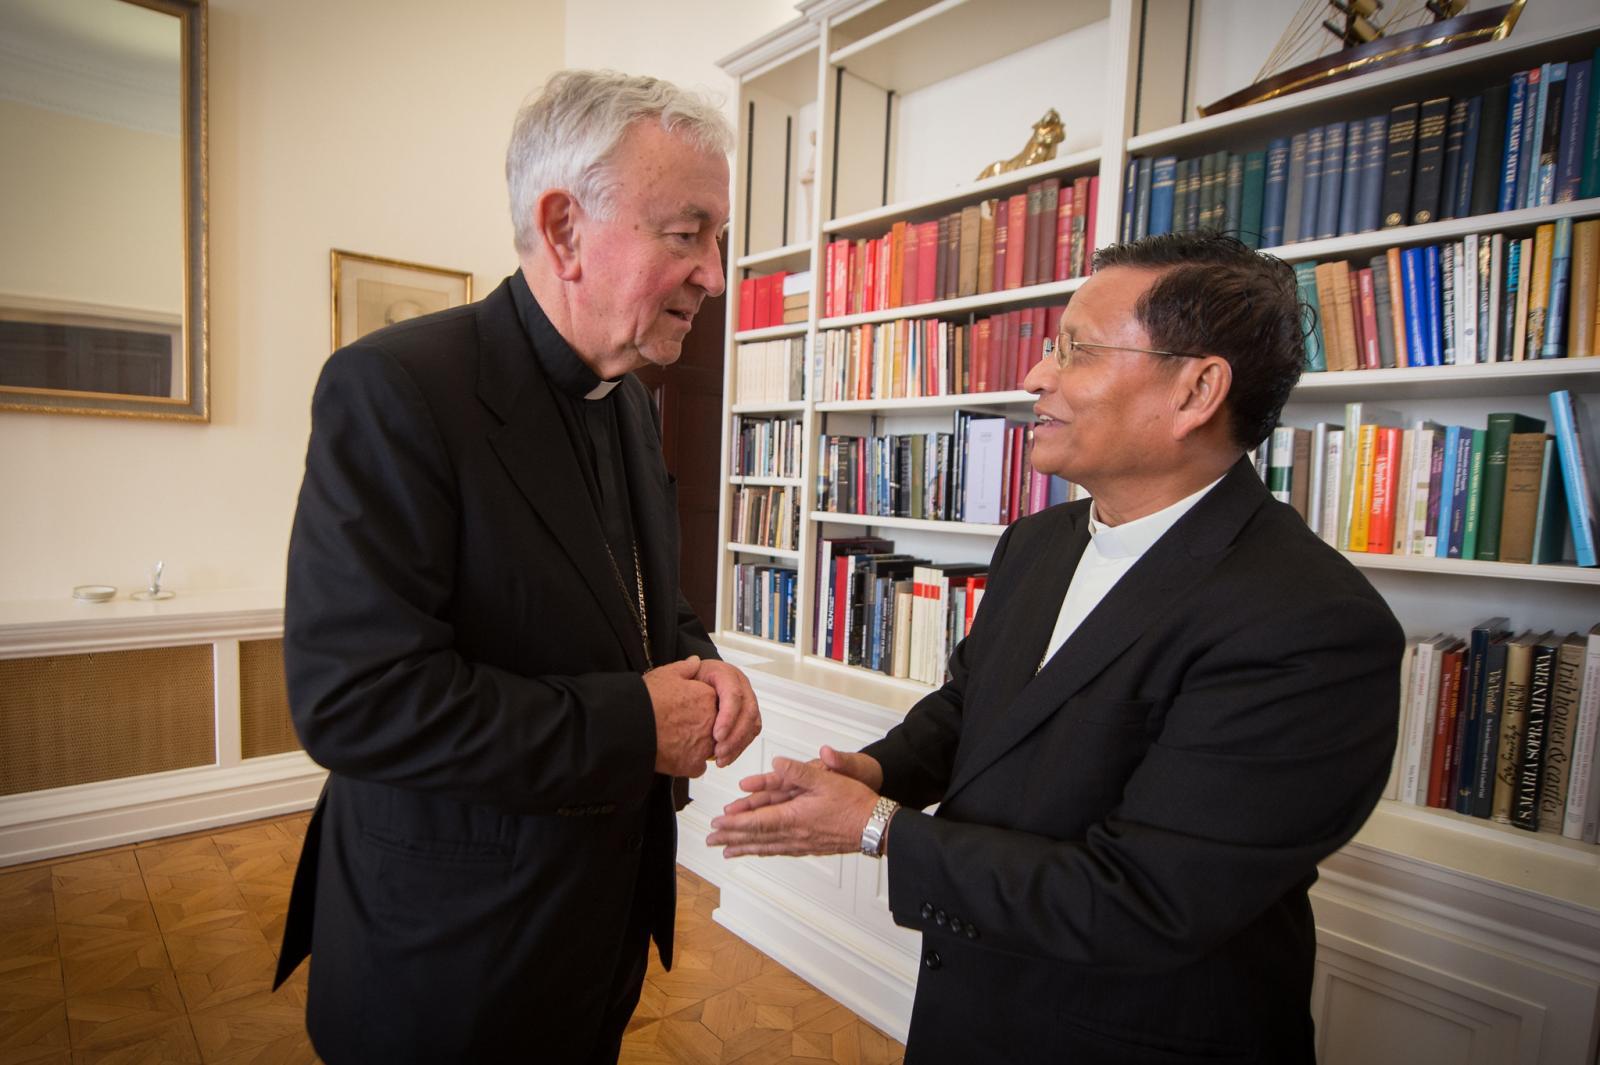 Cardinal prays for people of Myanmar - Diocese of Westminster